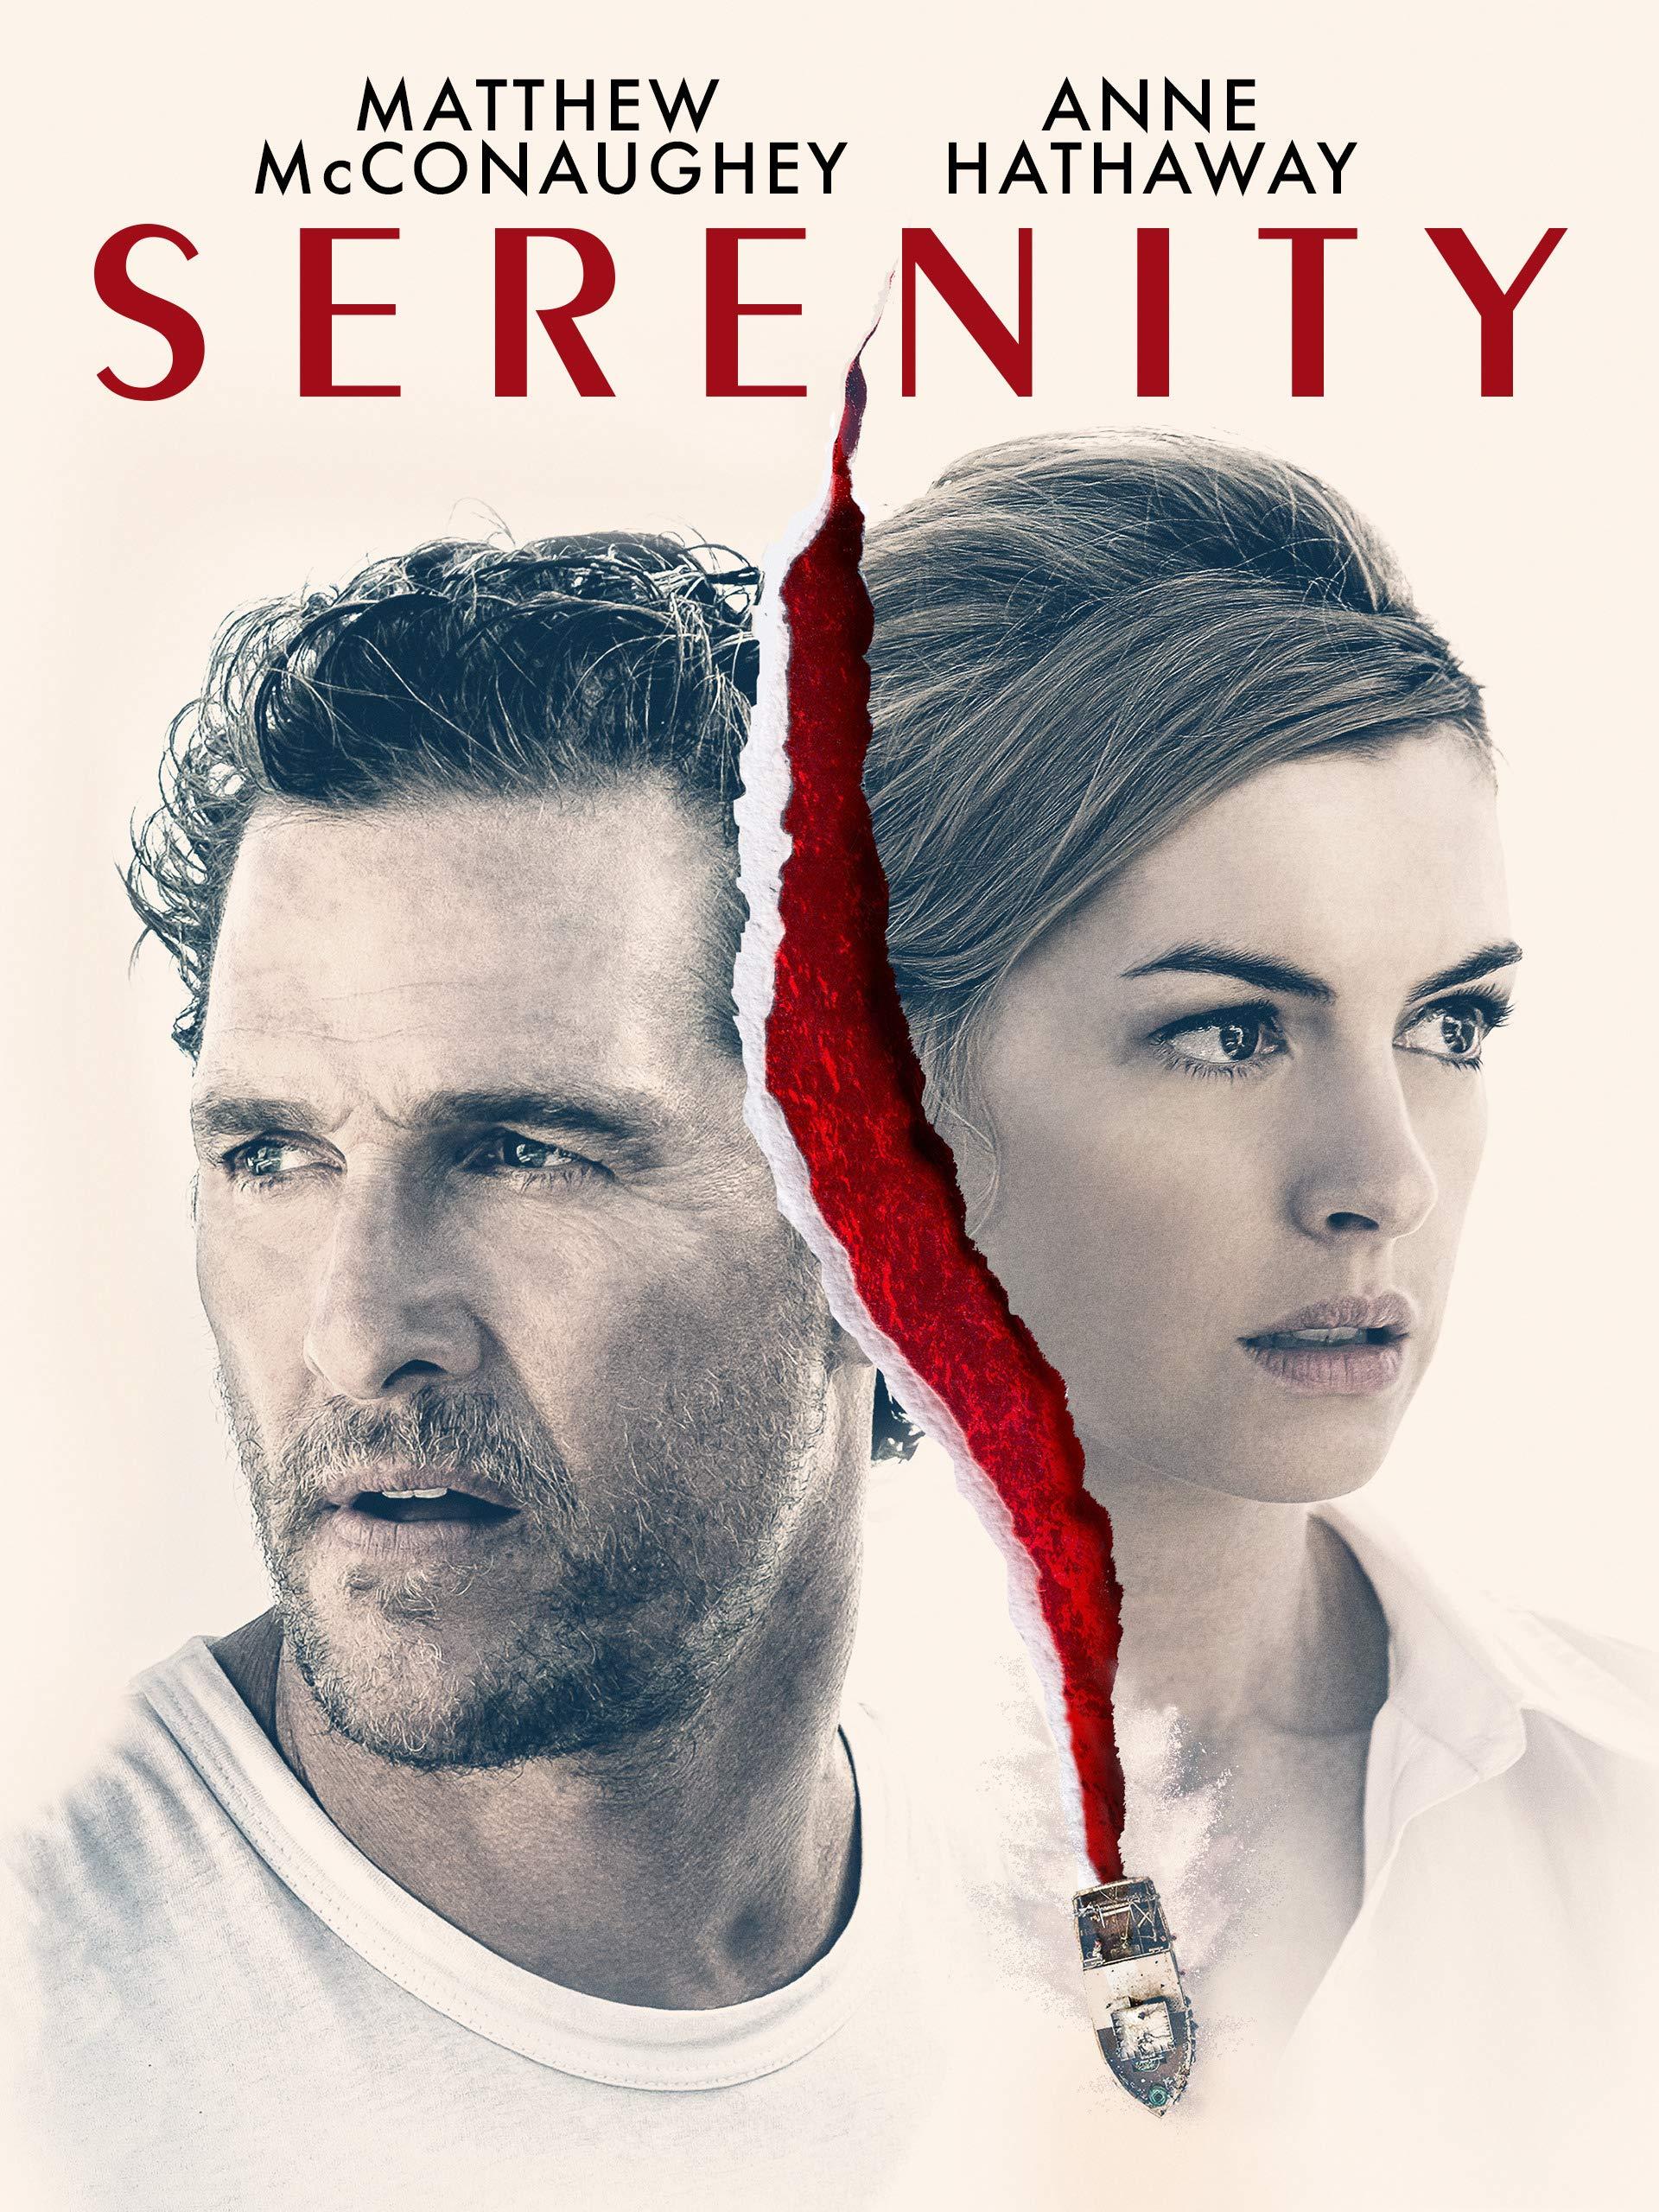 Amazon.com: Serenity (2019): Matthew McConaughey, Anne Hathaway ...